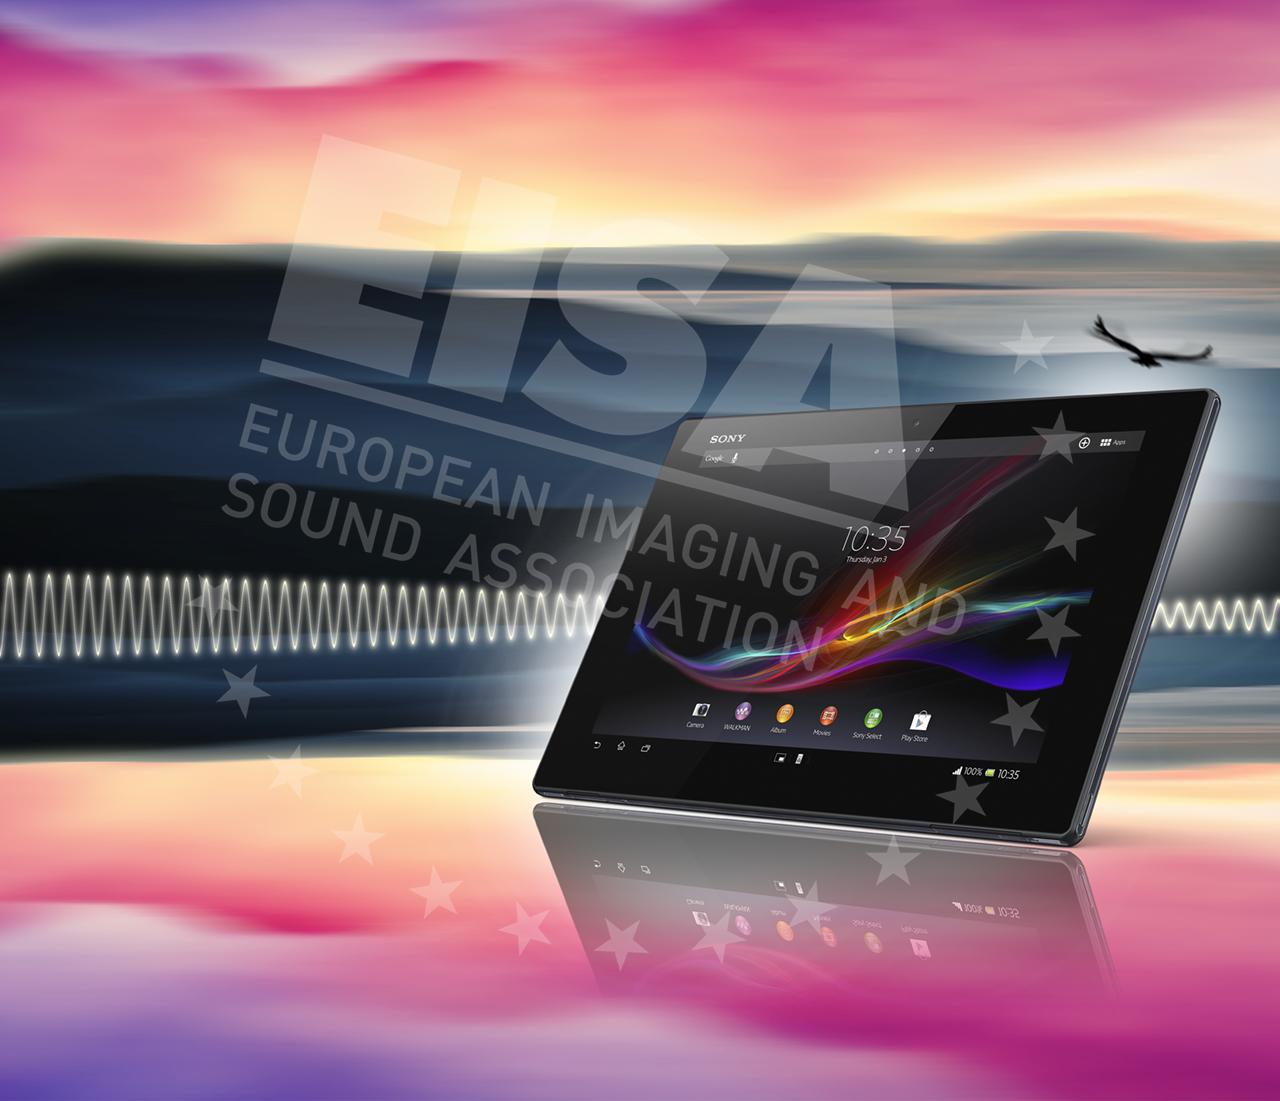 sony-xperia-tablet-zjpg.jpg